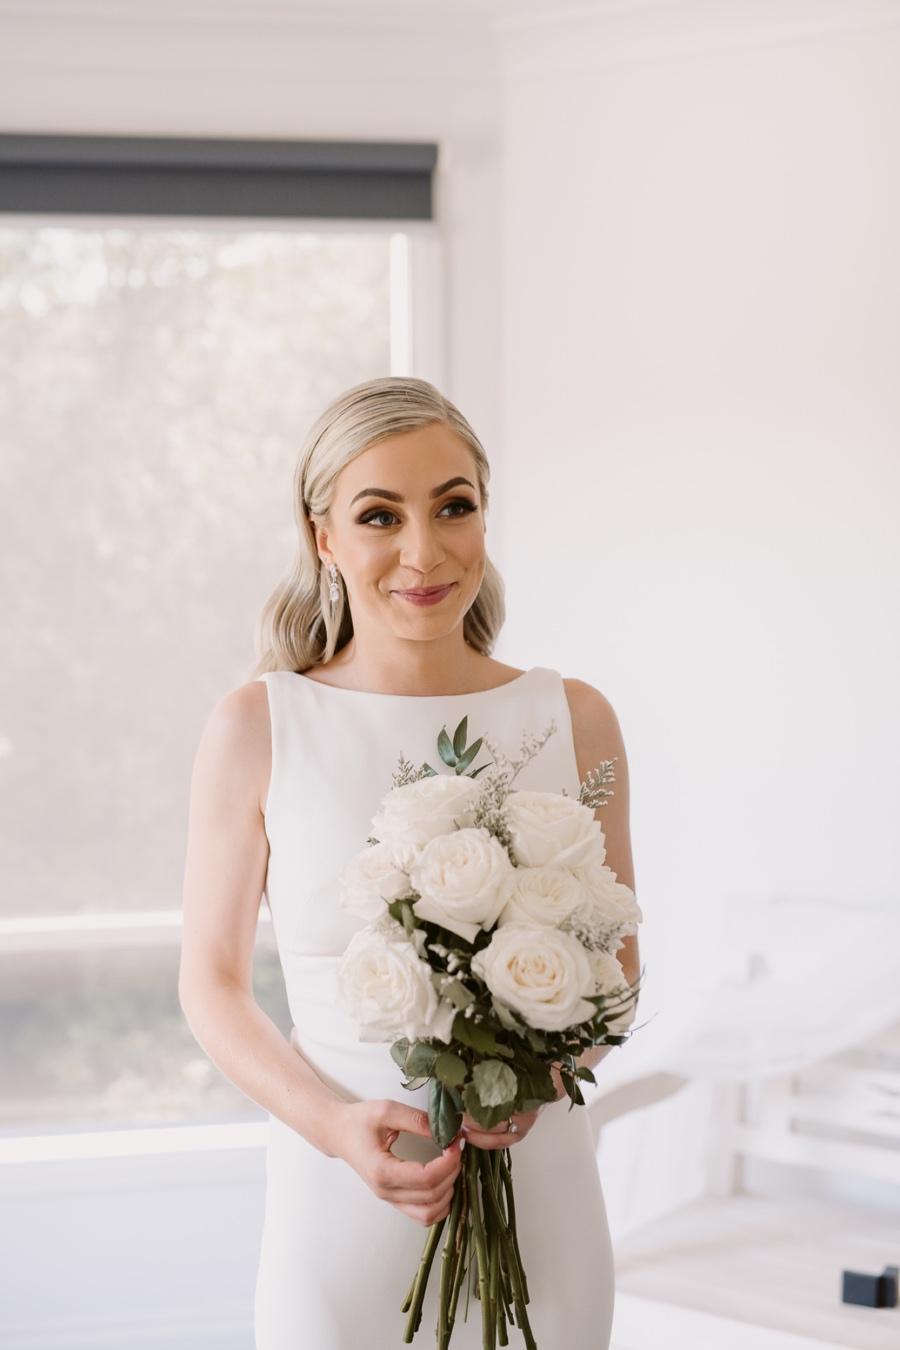 Quat Quatta Melbourne Wedding Photography26.jpg